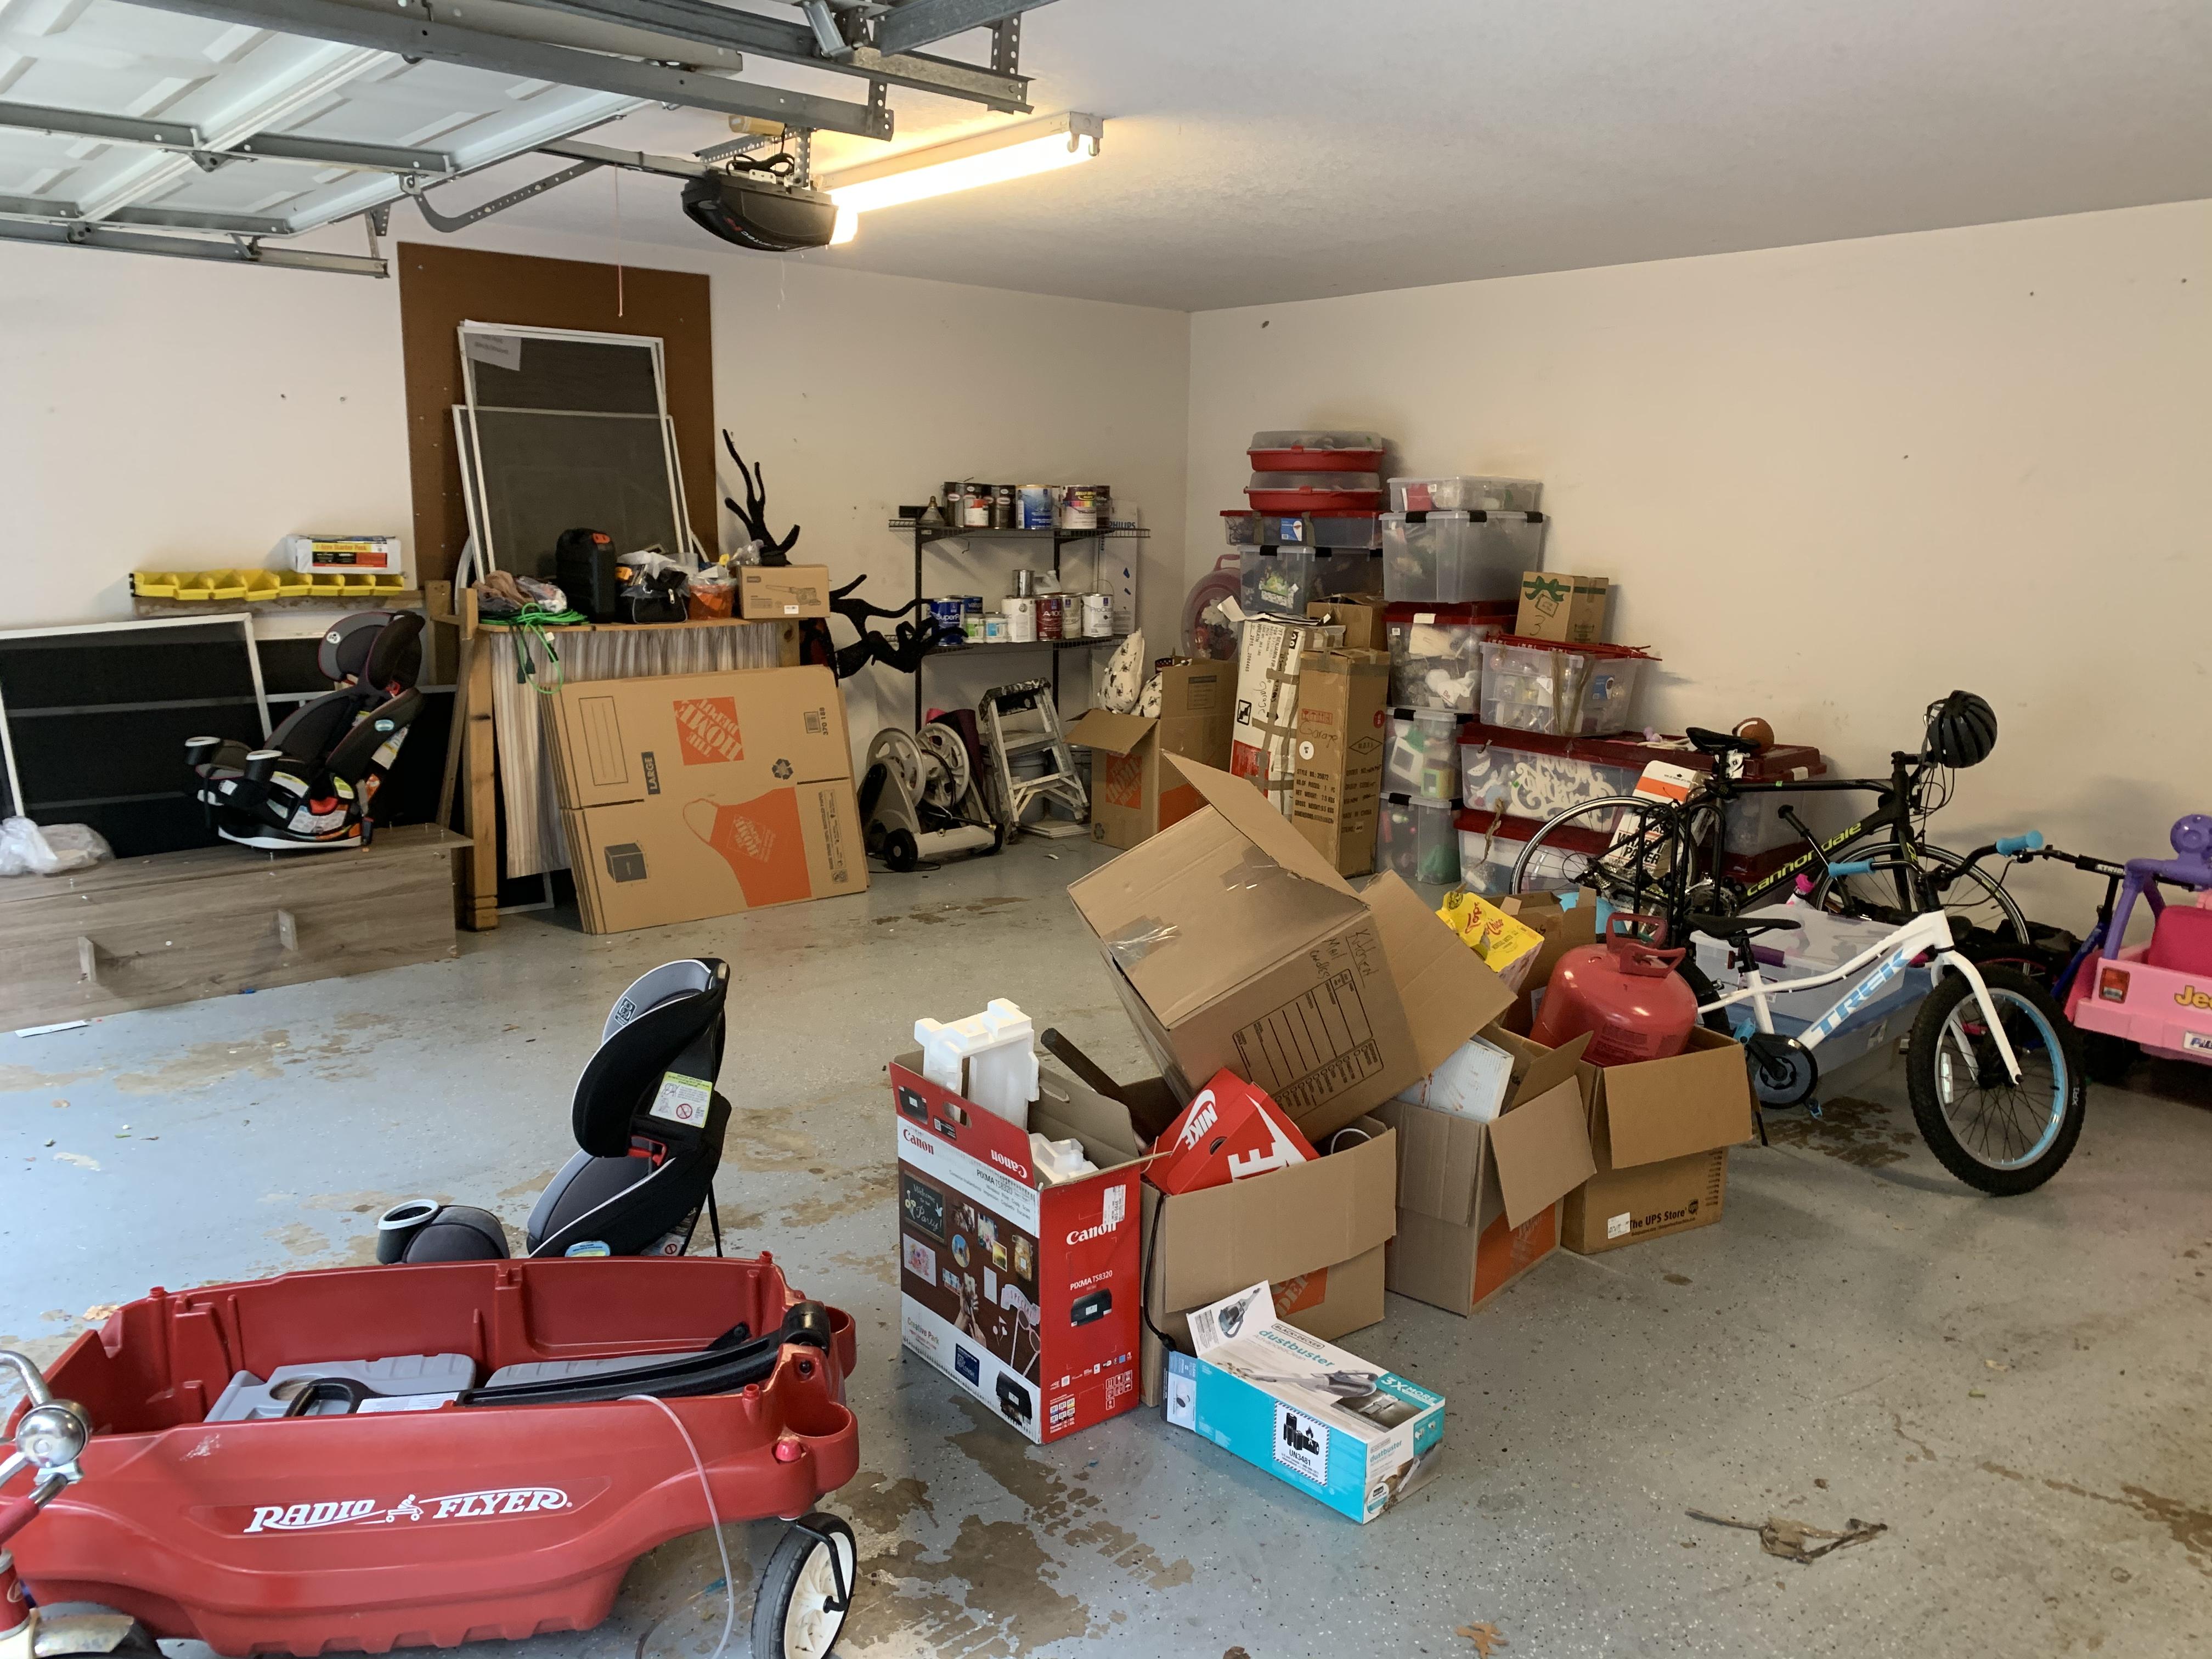 Organized Garage (before unpacking)